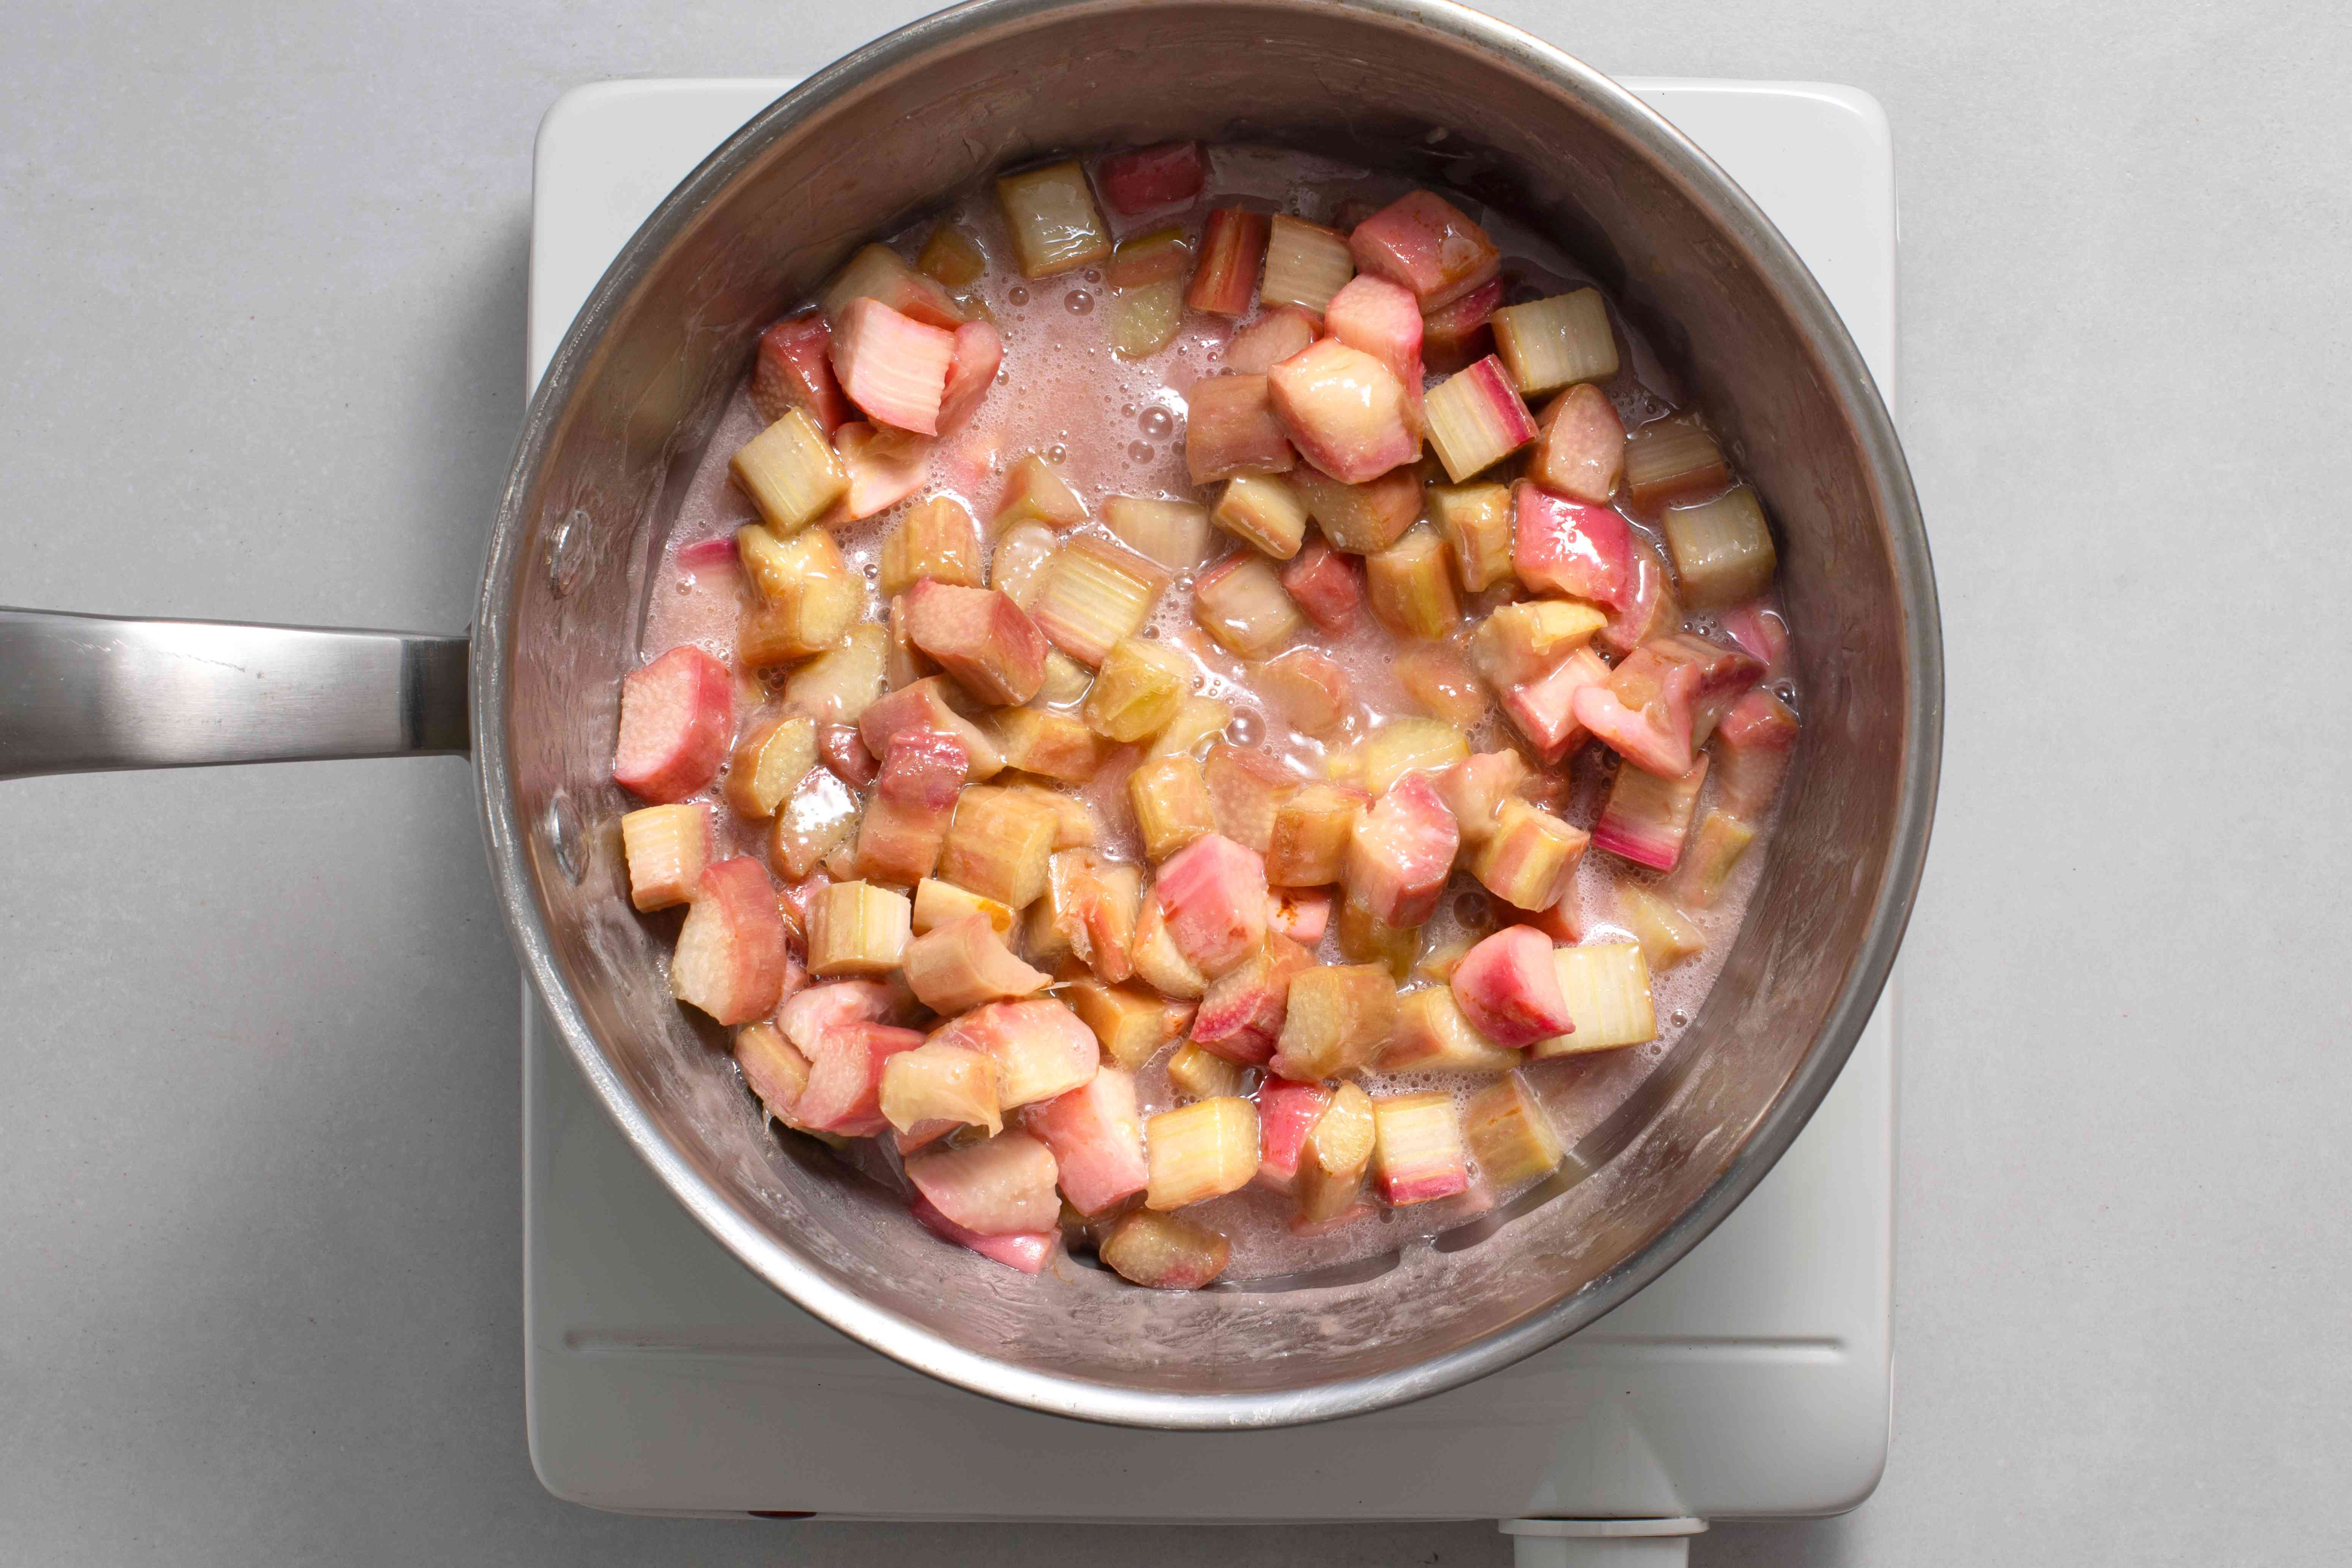 Rhubarb mixture cooking in a saucepan